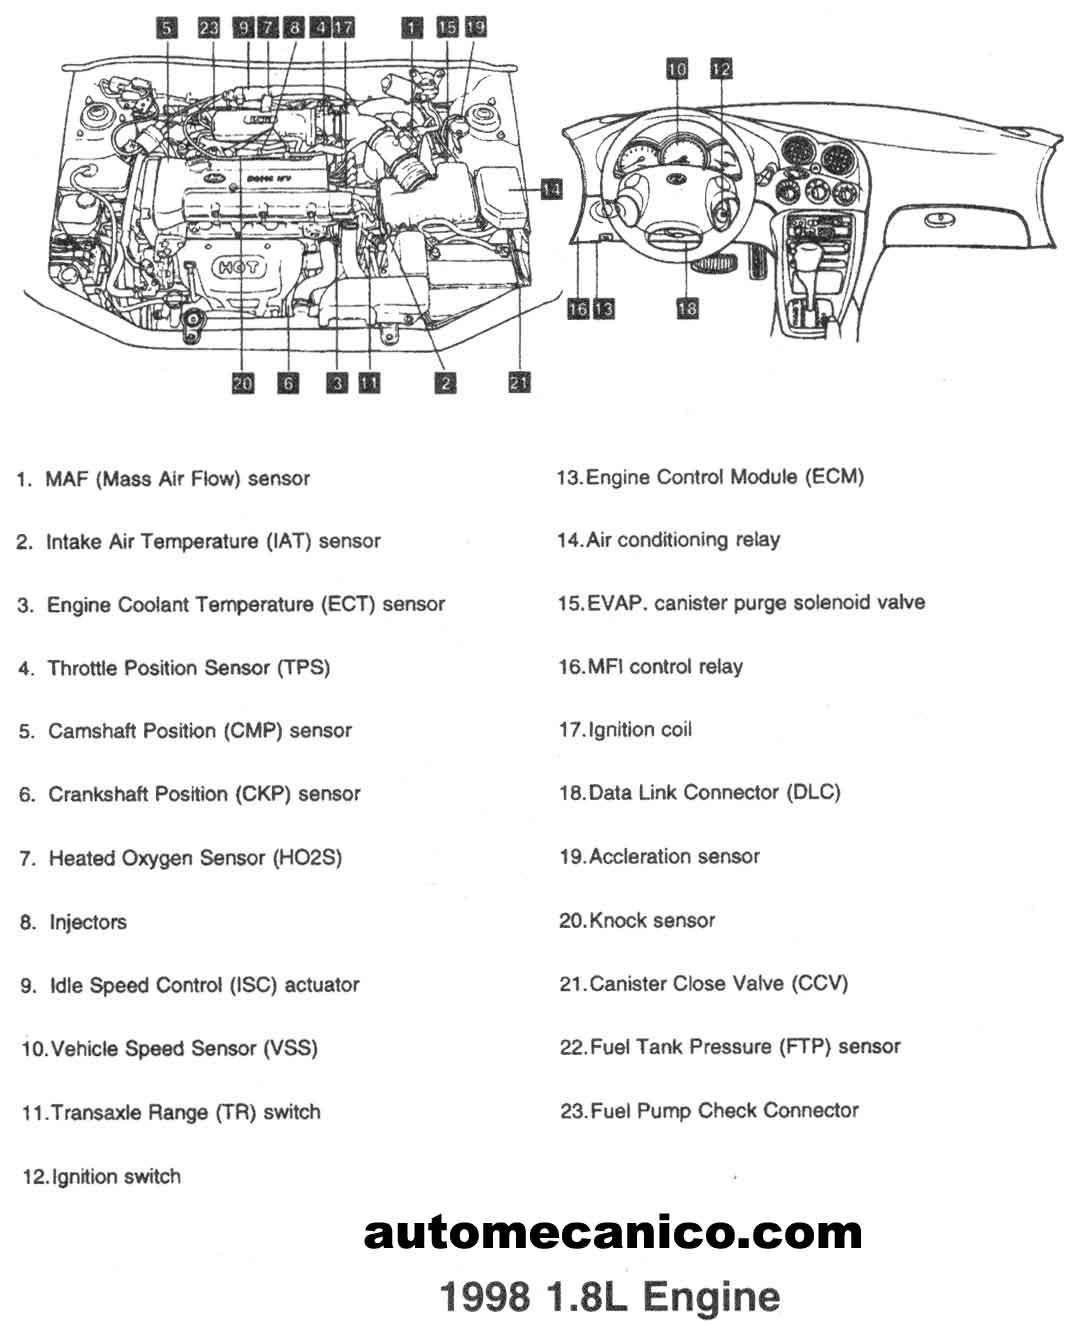 hyundai elantra diagram motor